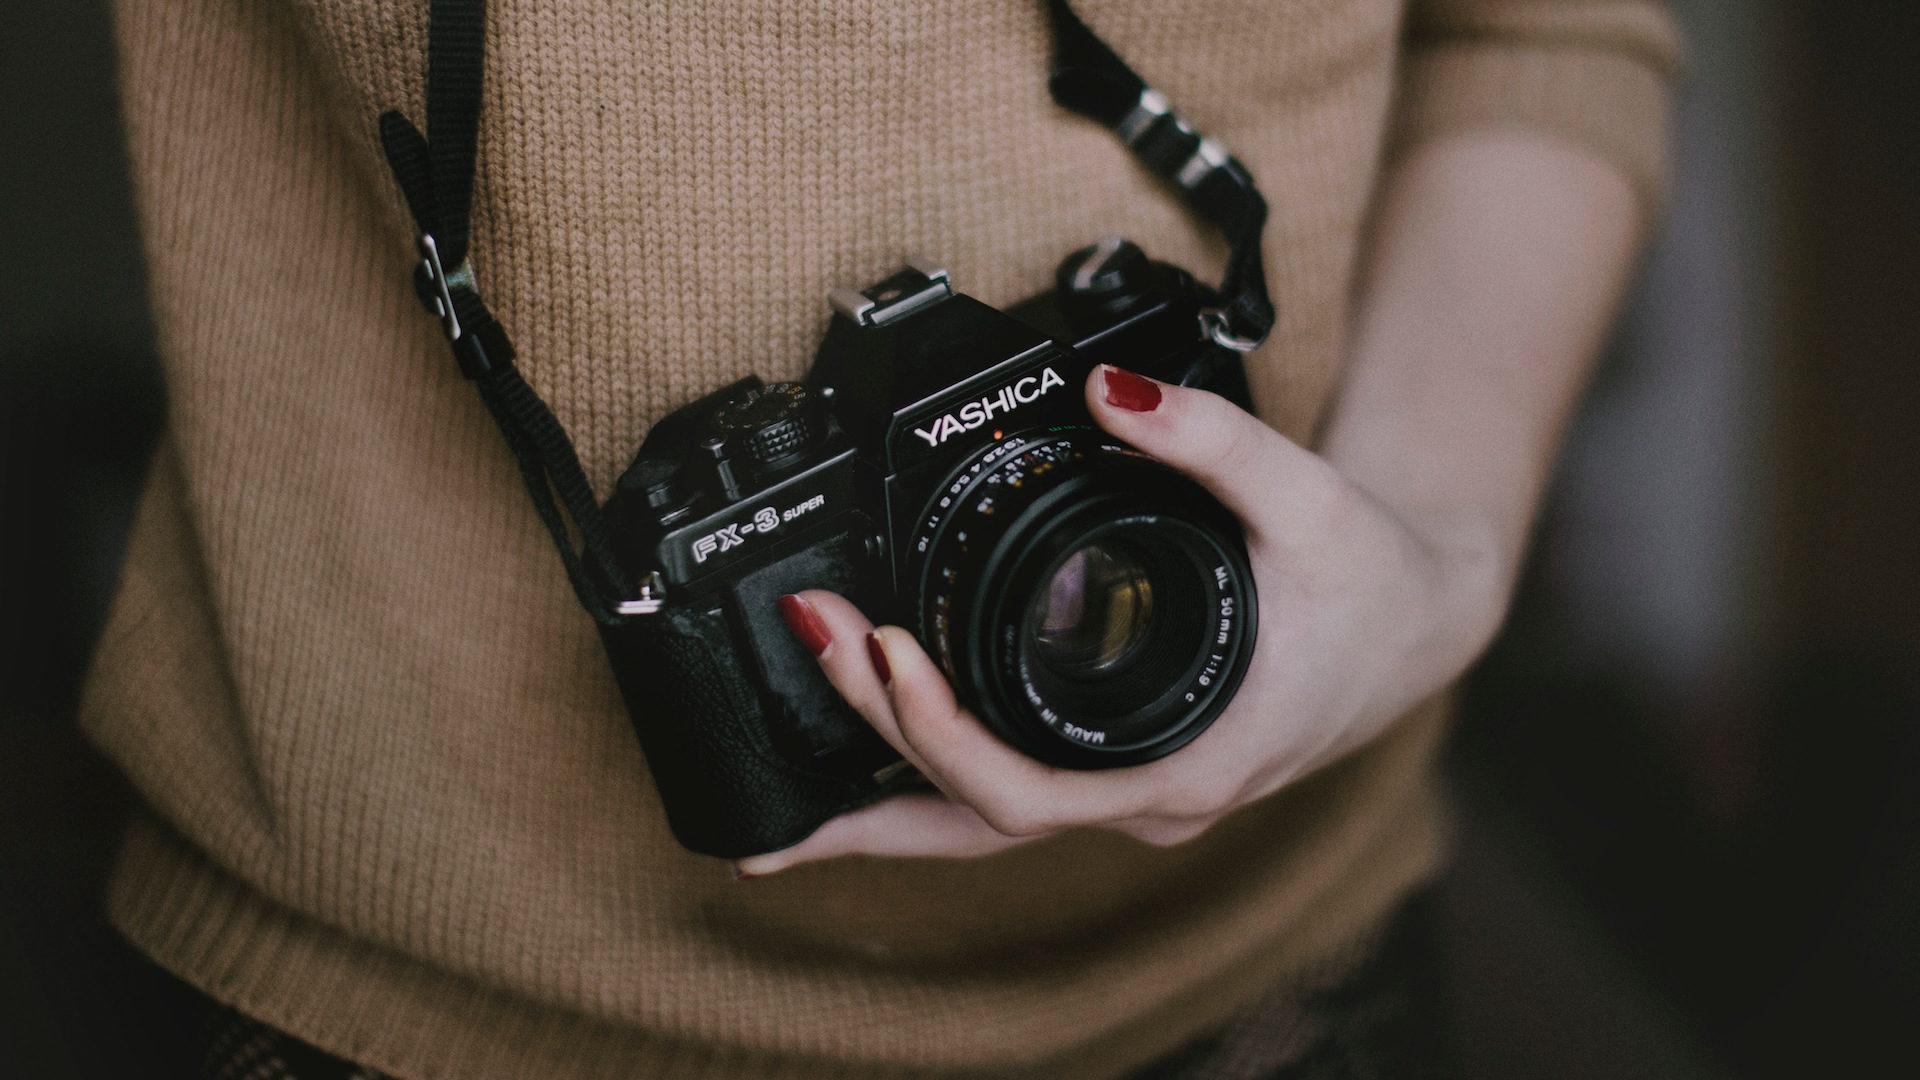 fotocamera, donna, mani, fotografia, vintage - Sfondi HD - Professor-falken.com